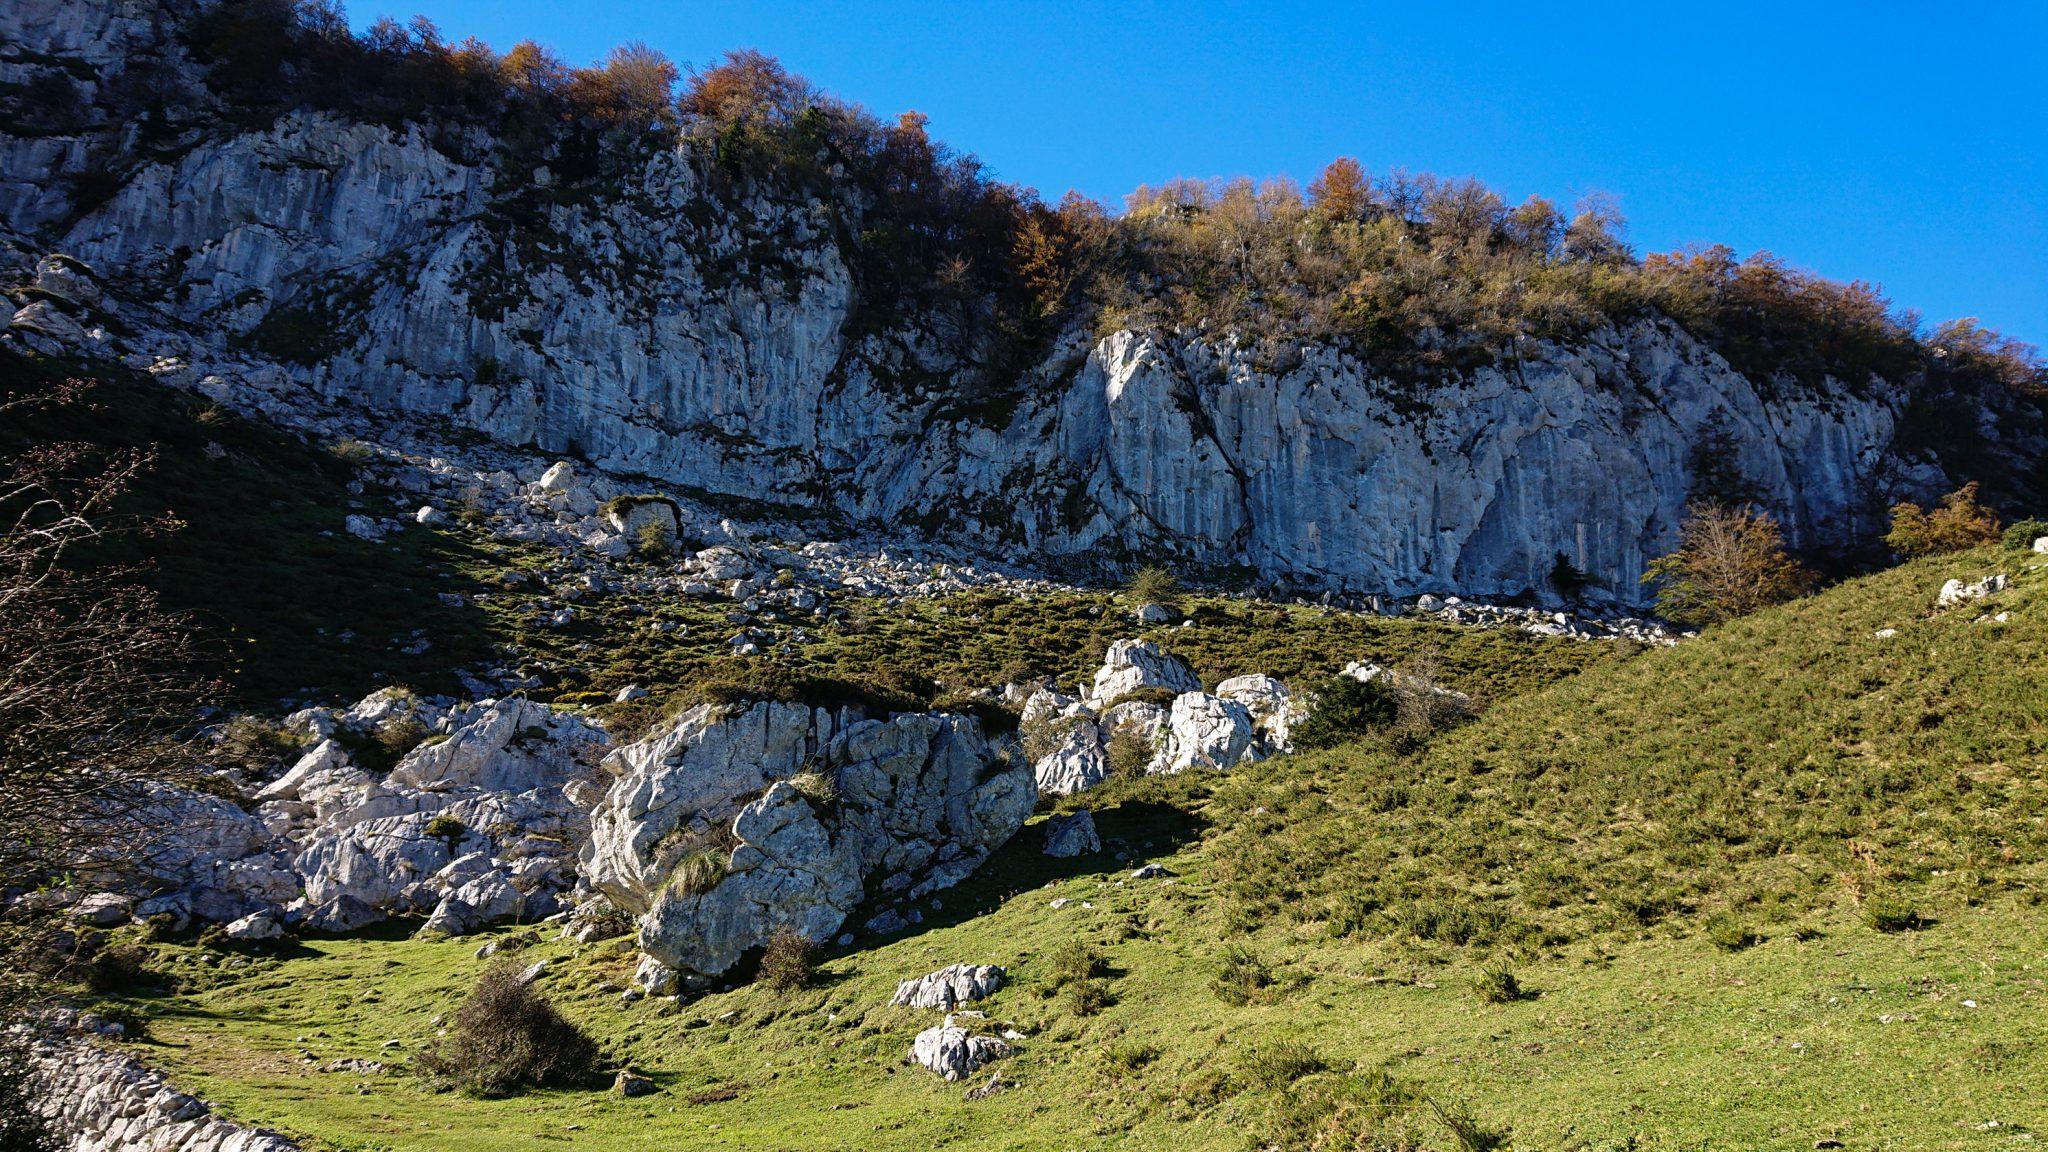 Wanderung Mirador de Ordiales Picos de Europa Spanien, Steilwand, Berge und Felsen